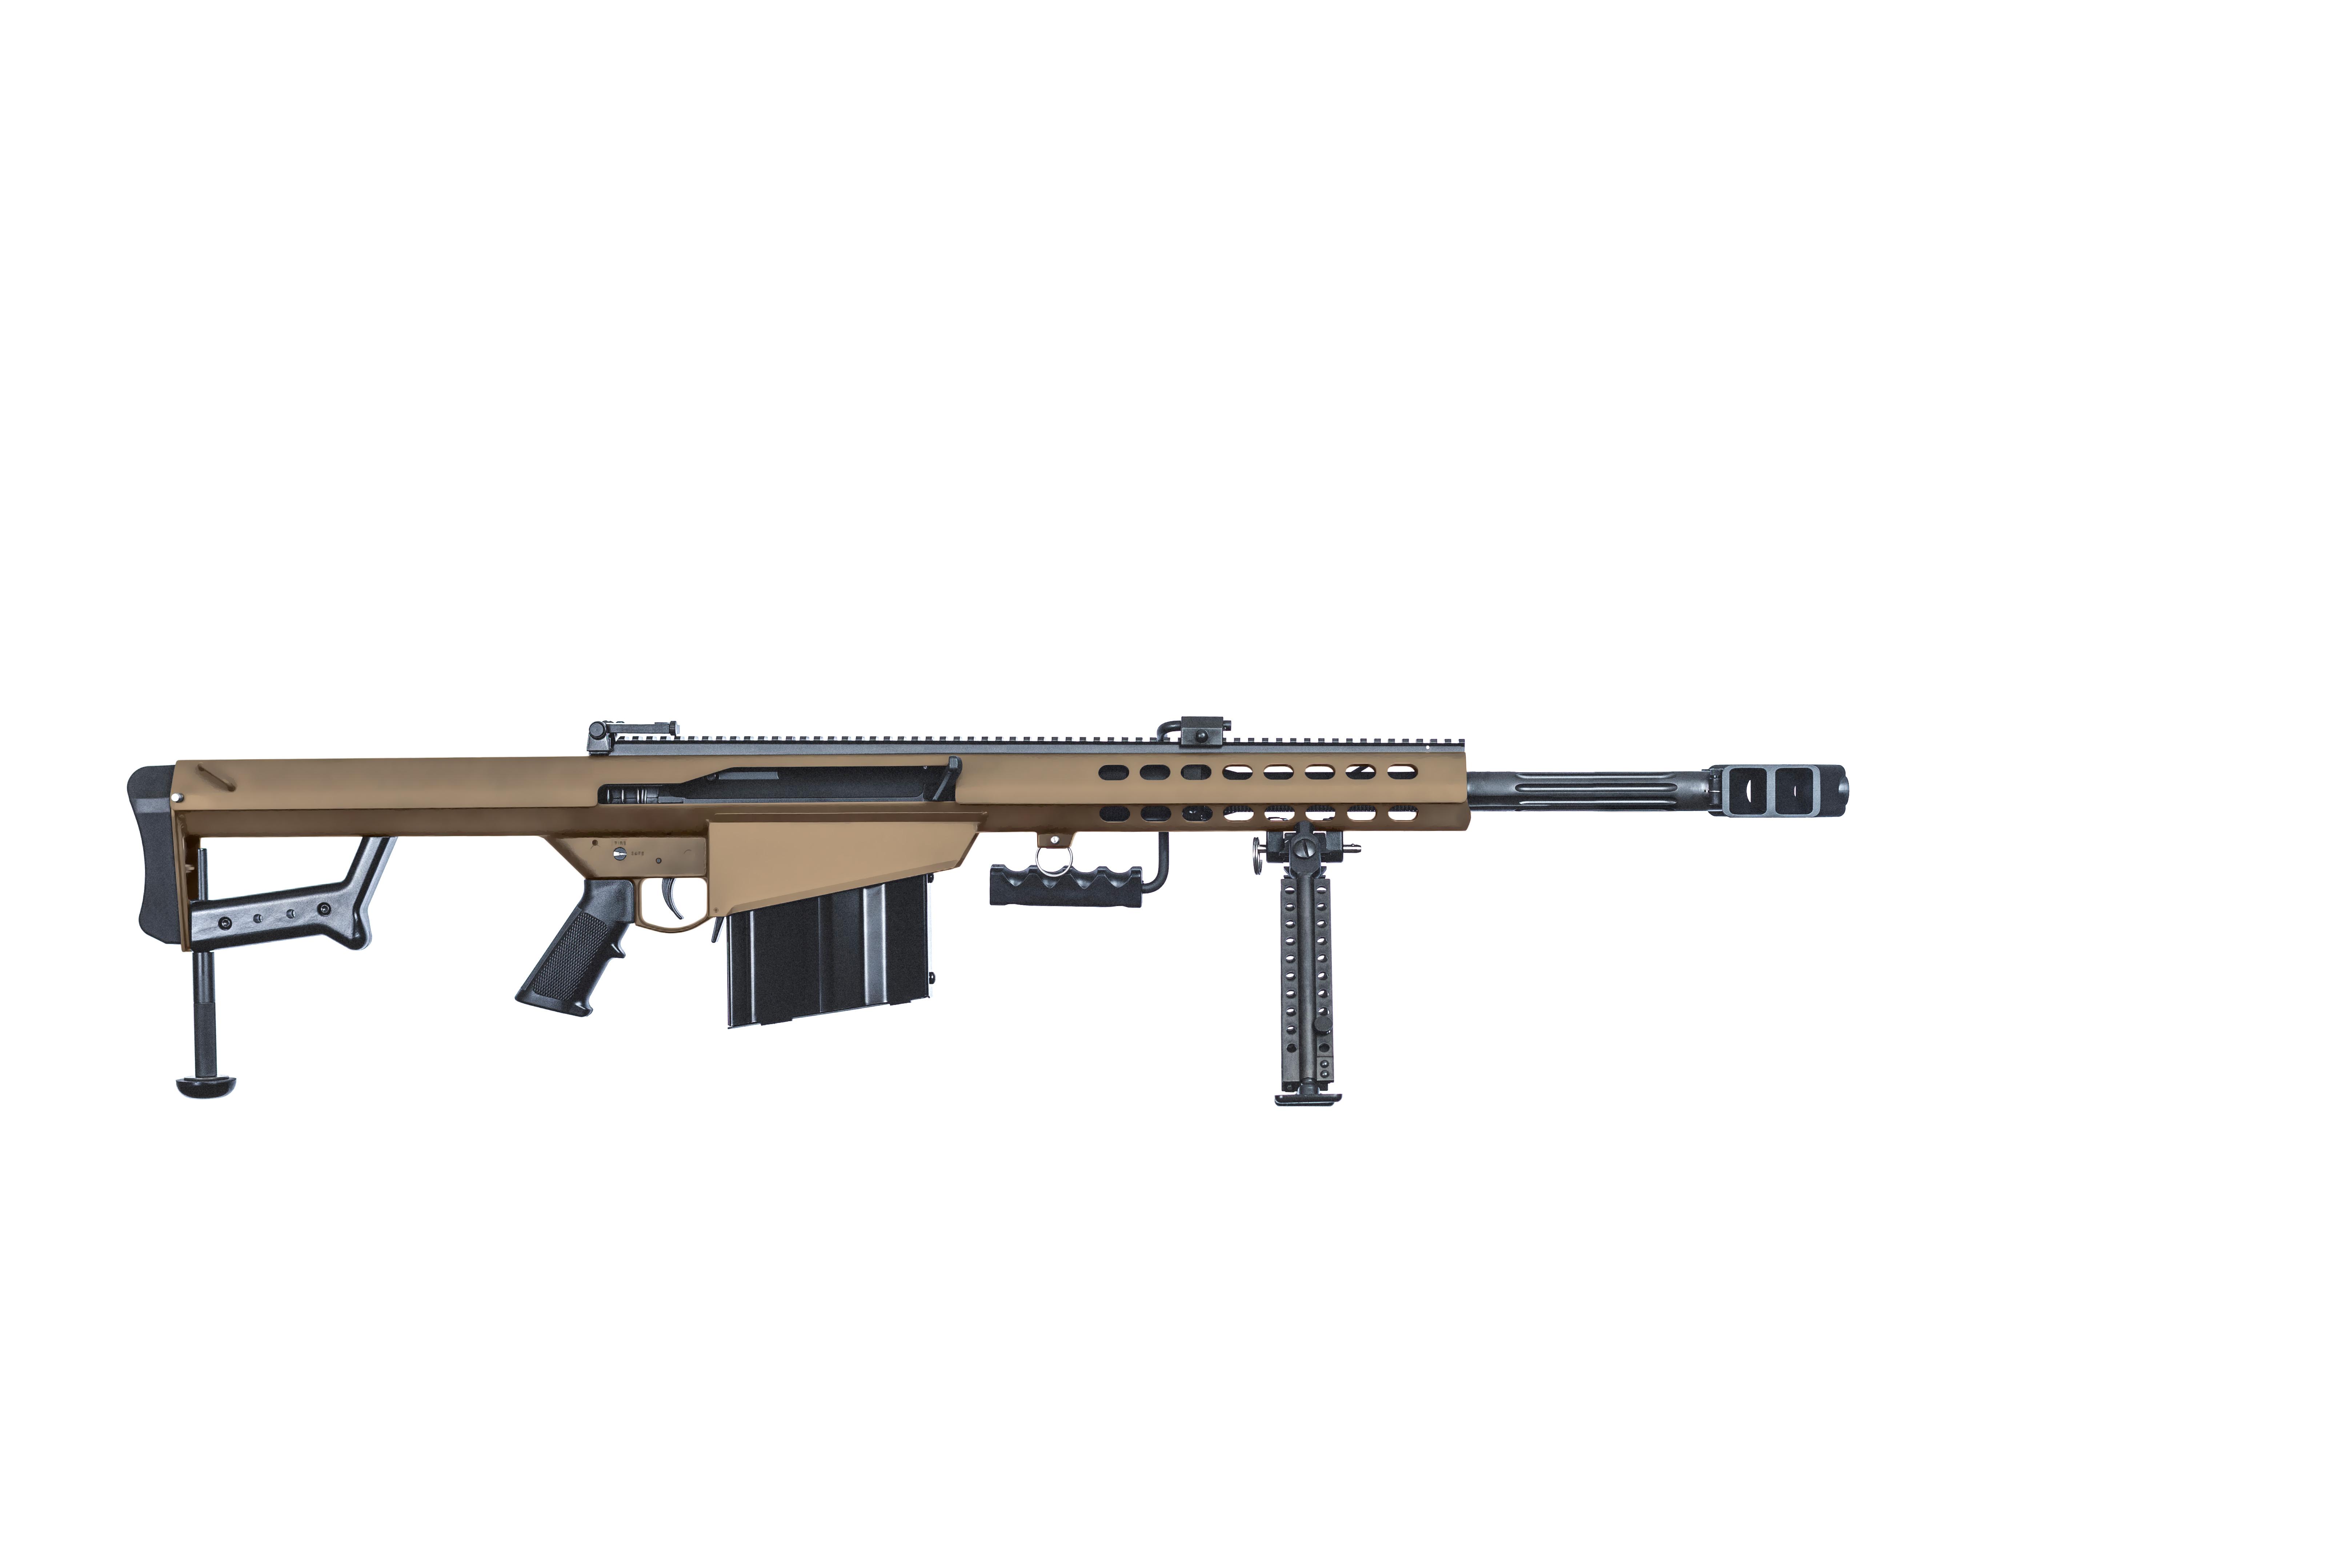 Barrett Firearms MODEL 82A1 50 BMG